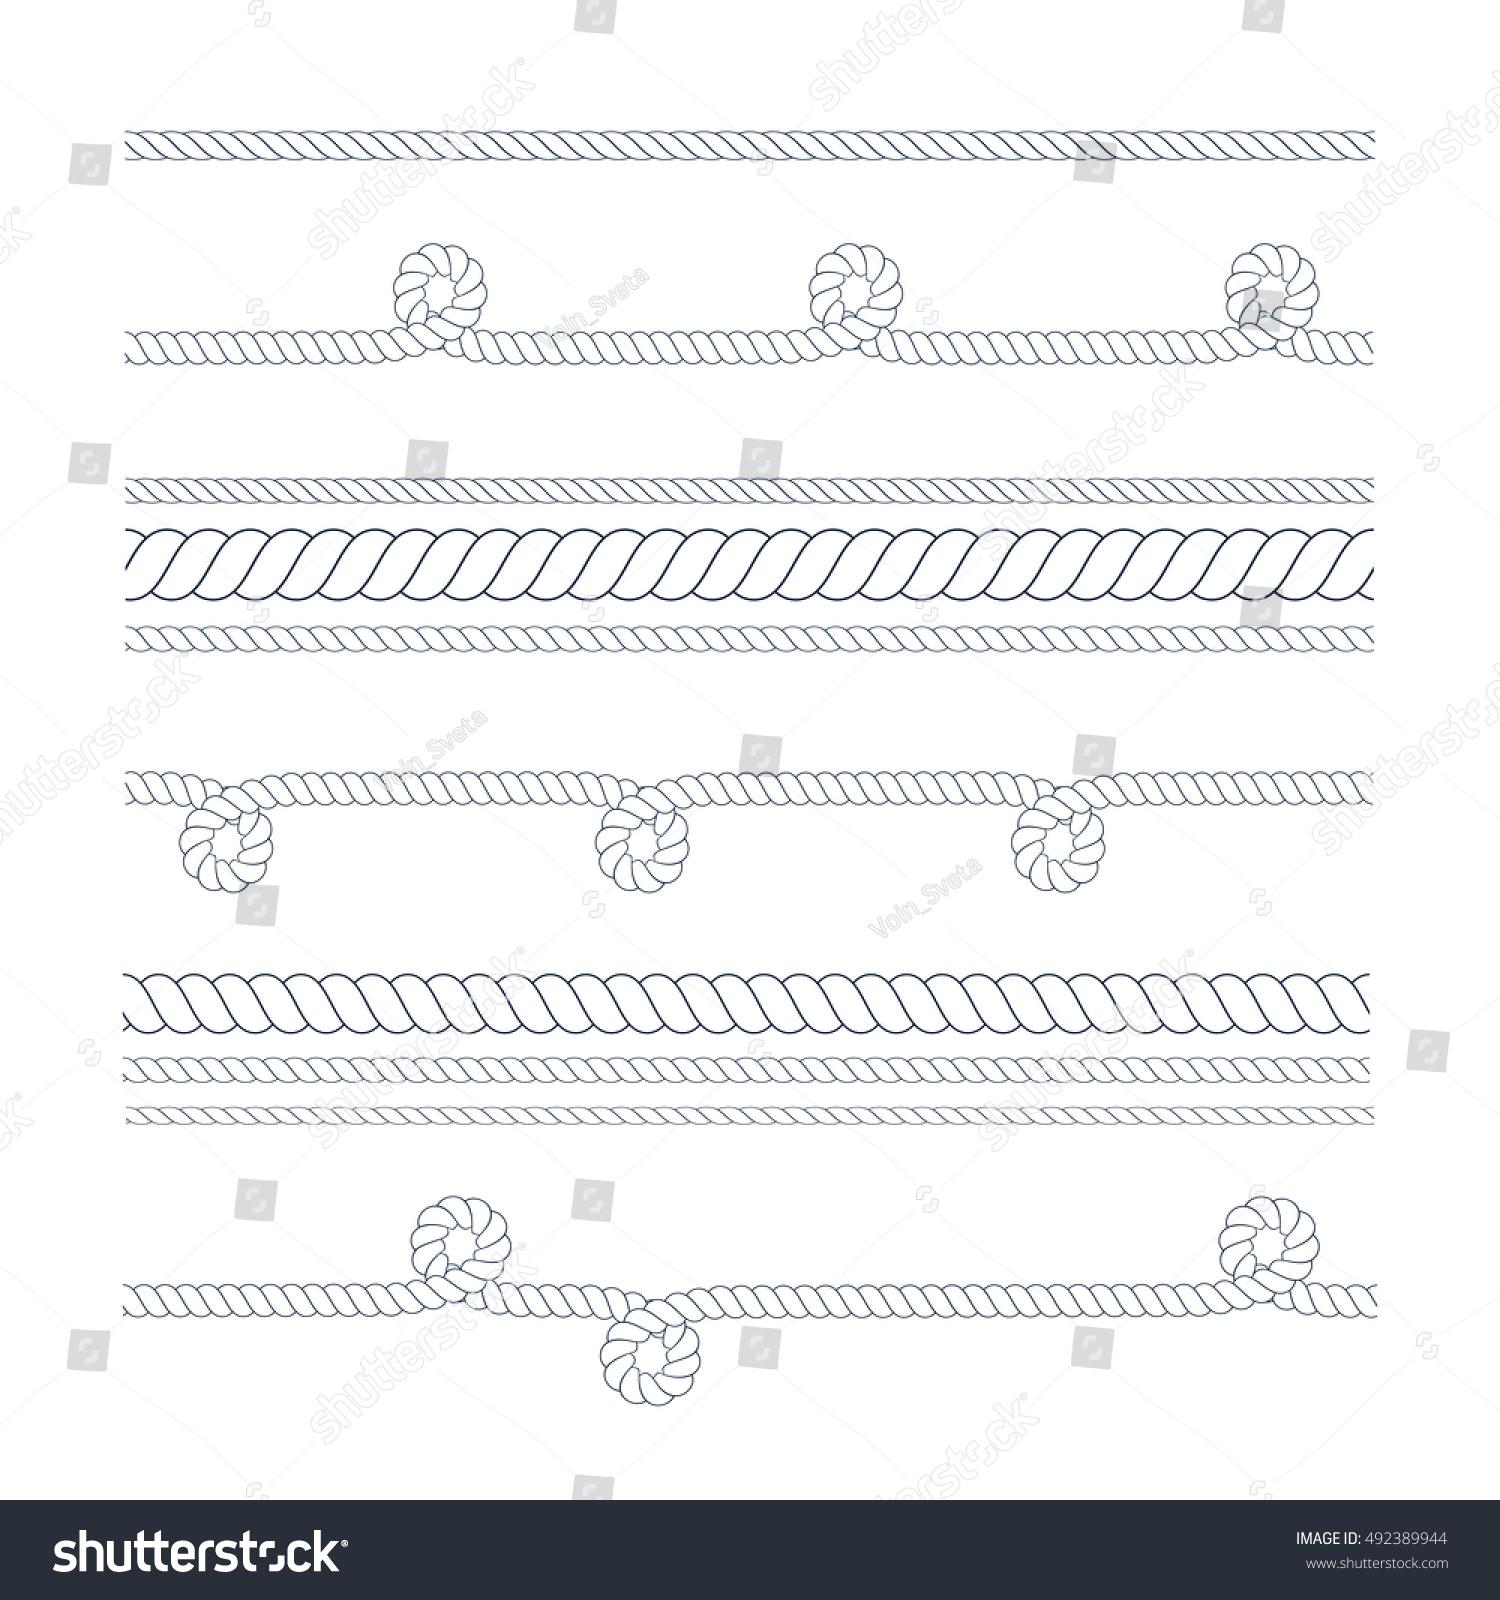 Nautical Rope Border Vector